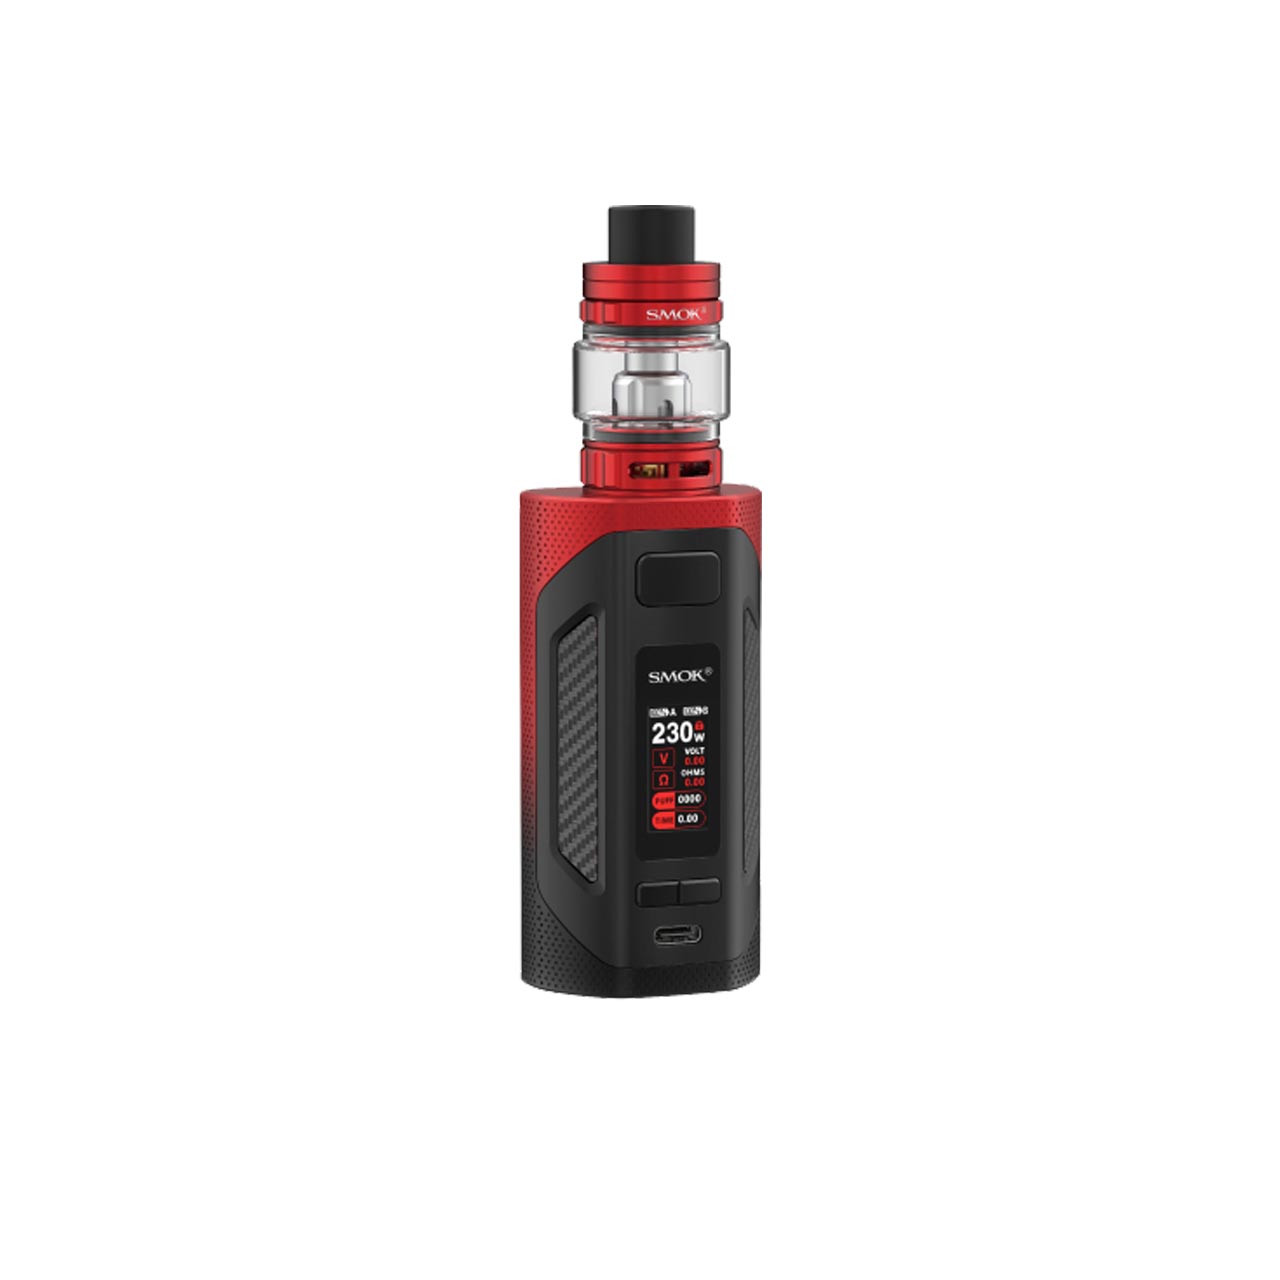 SMOK RIGEL Kit Red